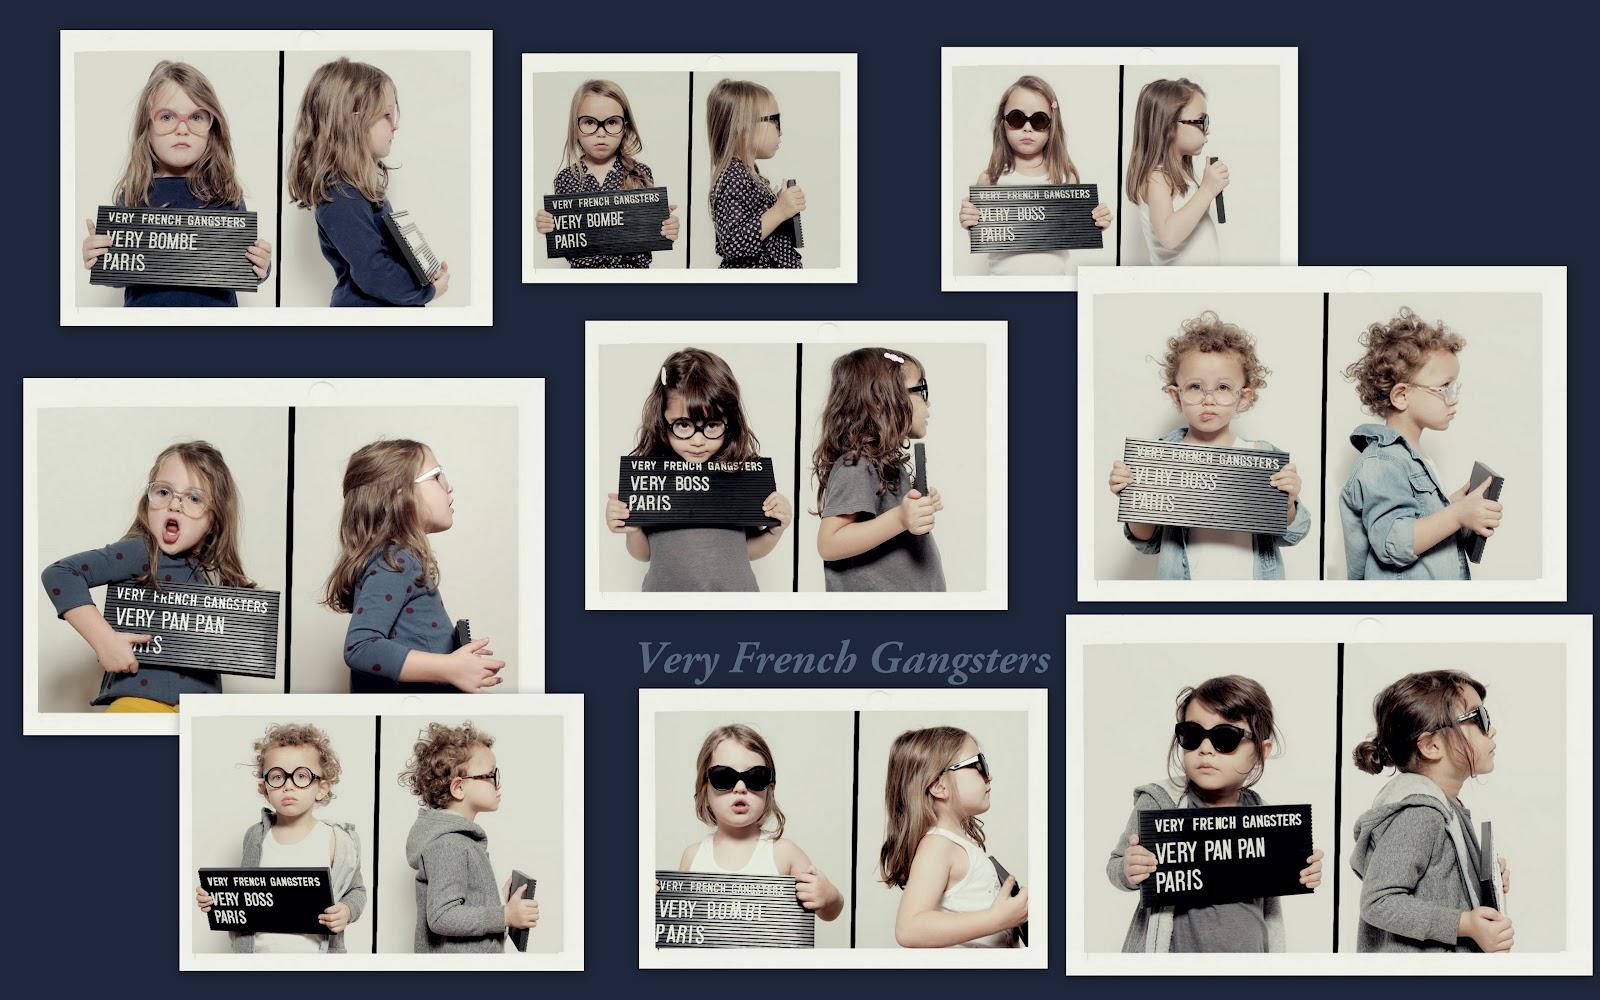 http://4.bp.blogspot.com/-KRIpLLahhyo/T5gYm9vfYpI/AAAAAAAACZY/u7F_xSX7Yi4/s1600/Very+French+Gangsters.jpg